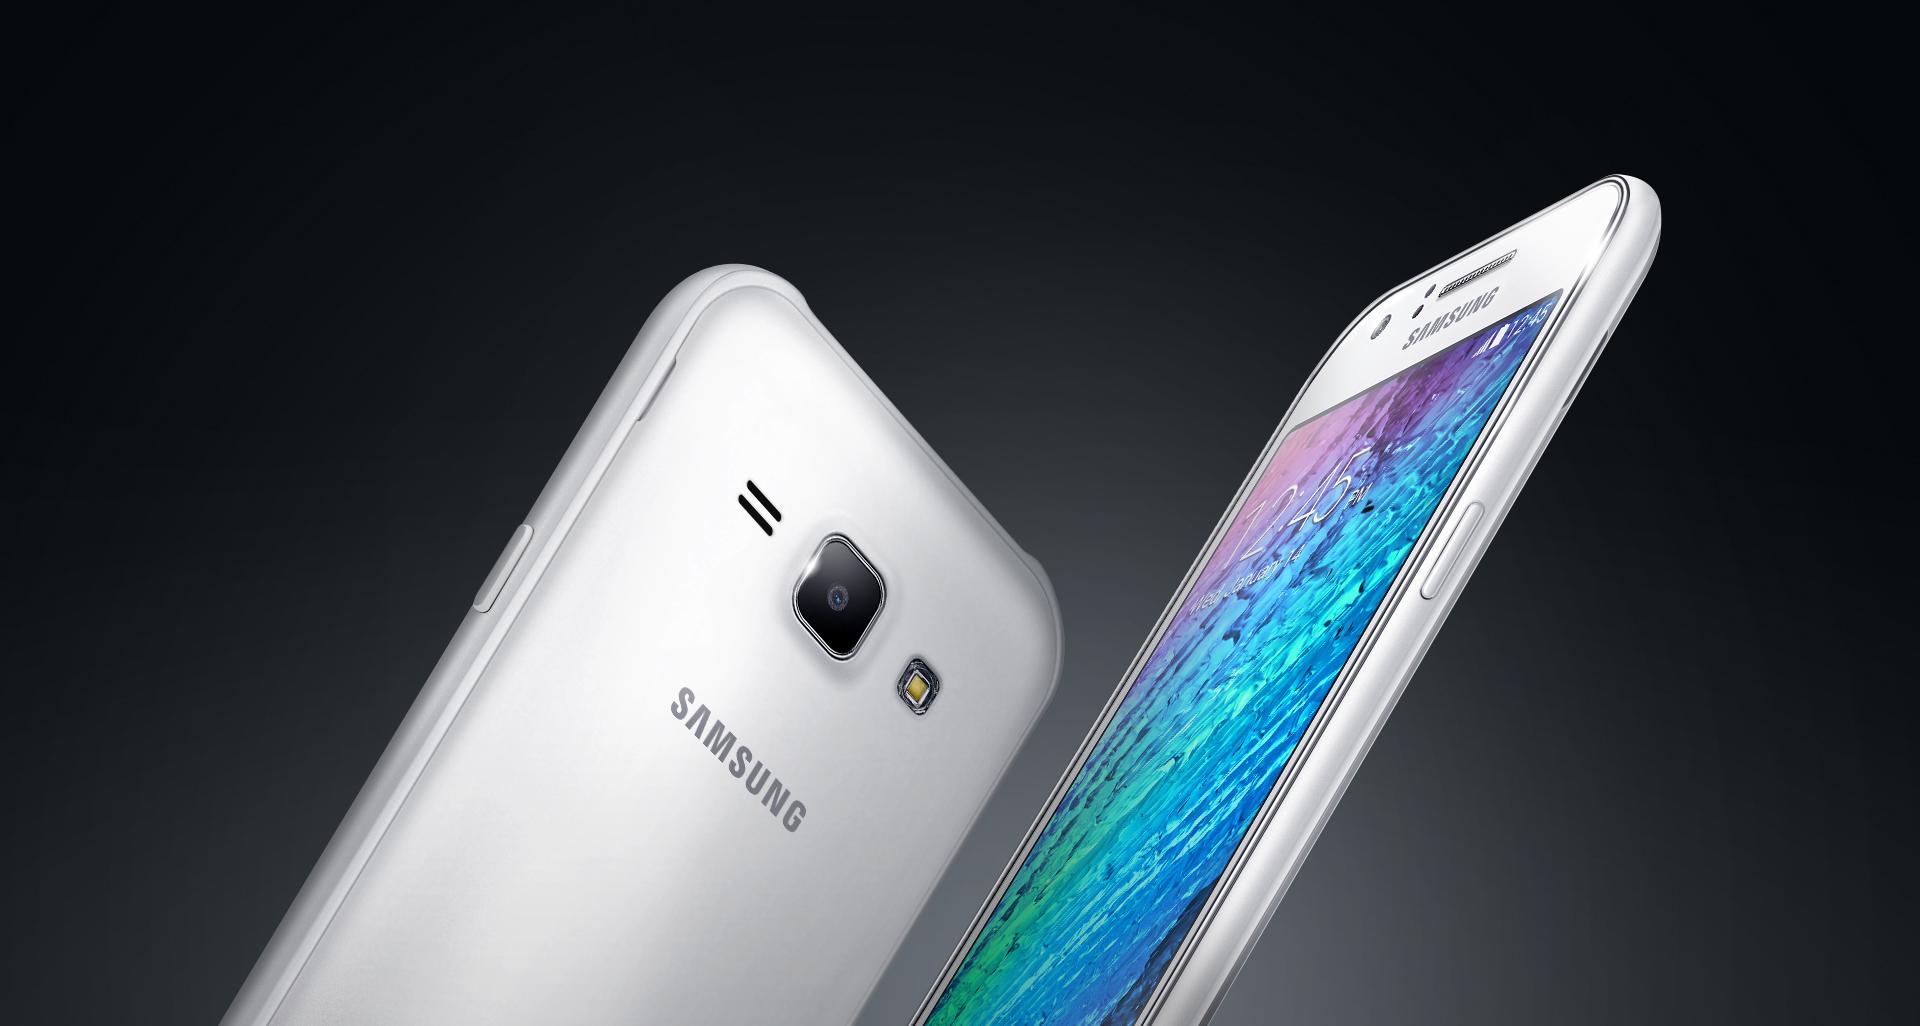 Photo of Specificatiile lui Samsung Galaxy J5 aparute in GFXBench